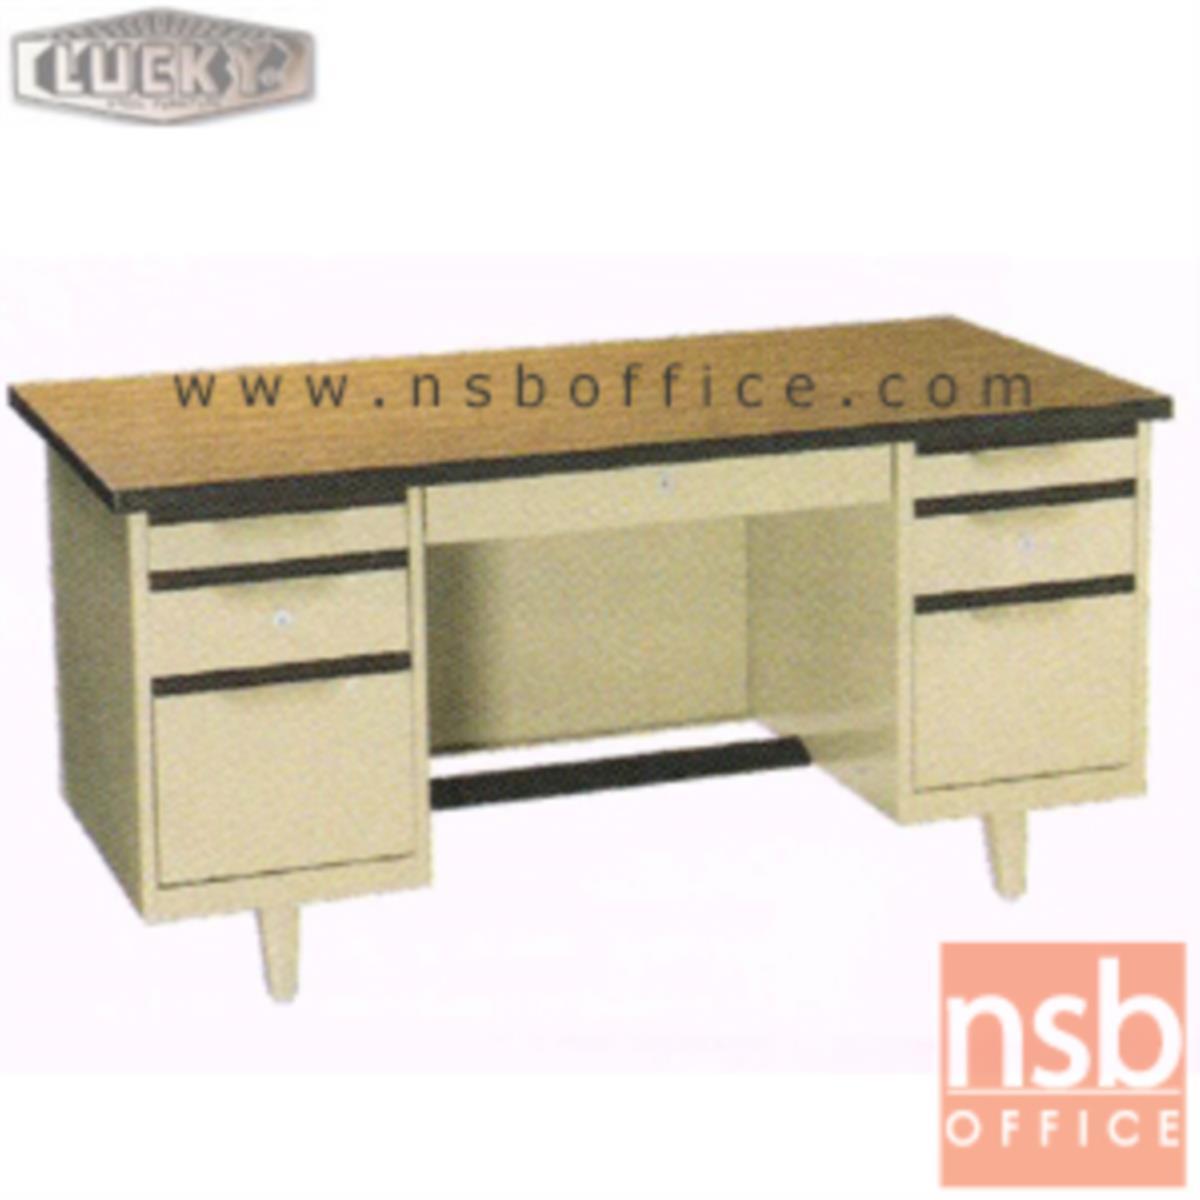 E28A107:โต๊ะทำงานเหล็กหน้าโฟเมก้าลายไม้ 7 ลิ้นชัก ยี่ห้อ Lucky  รุ่น NTC-2654,NTC-3060,NTC-3472